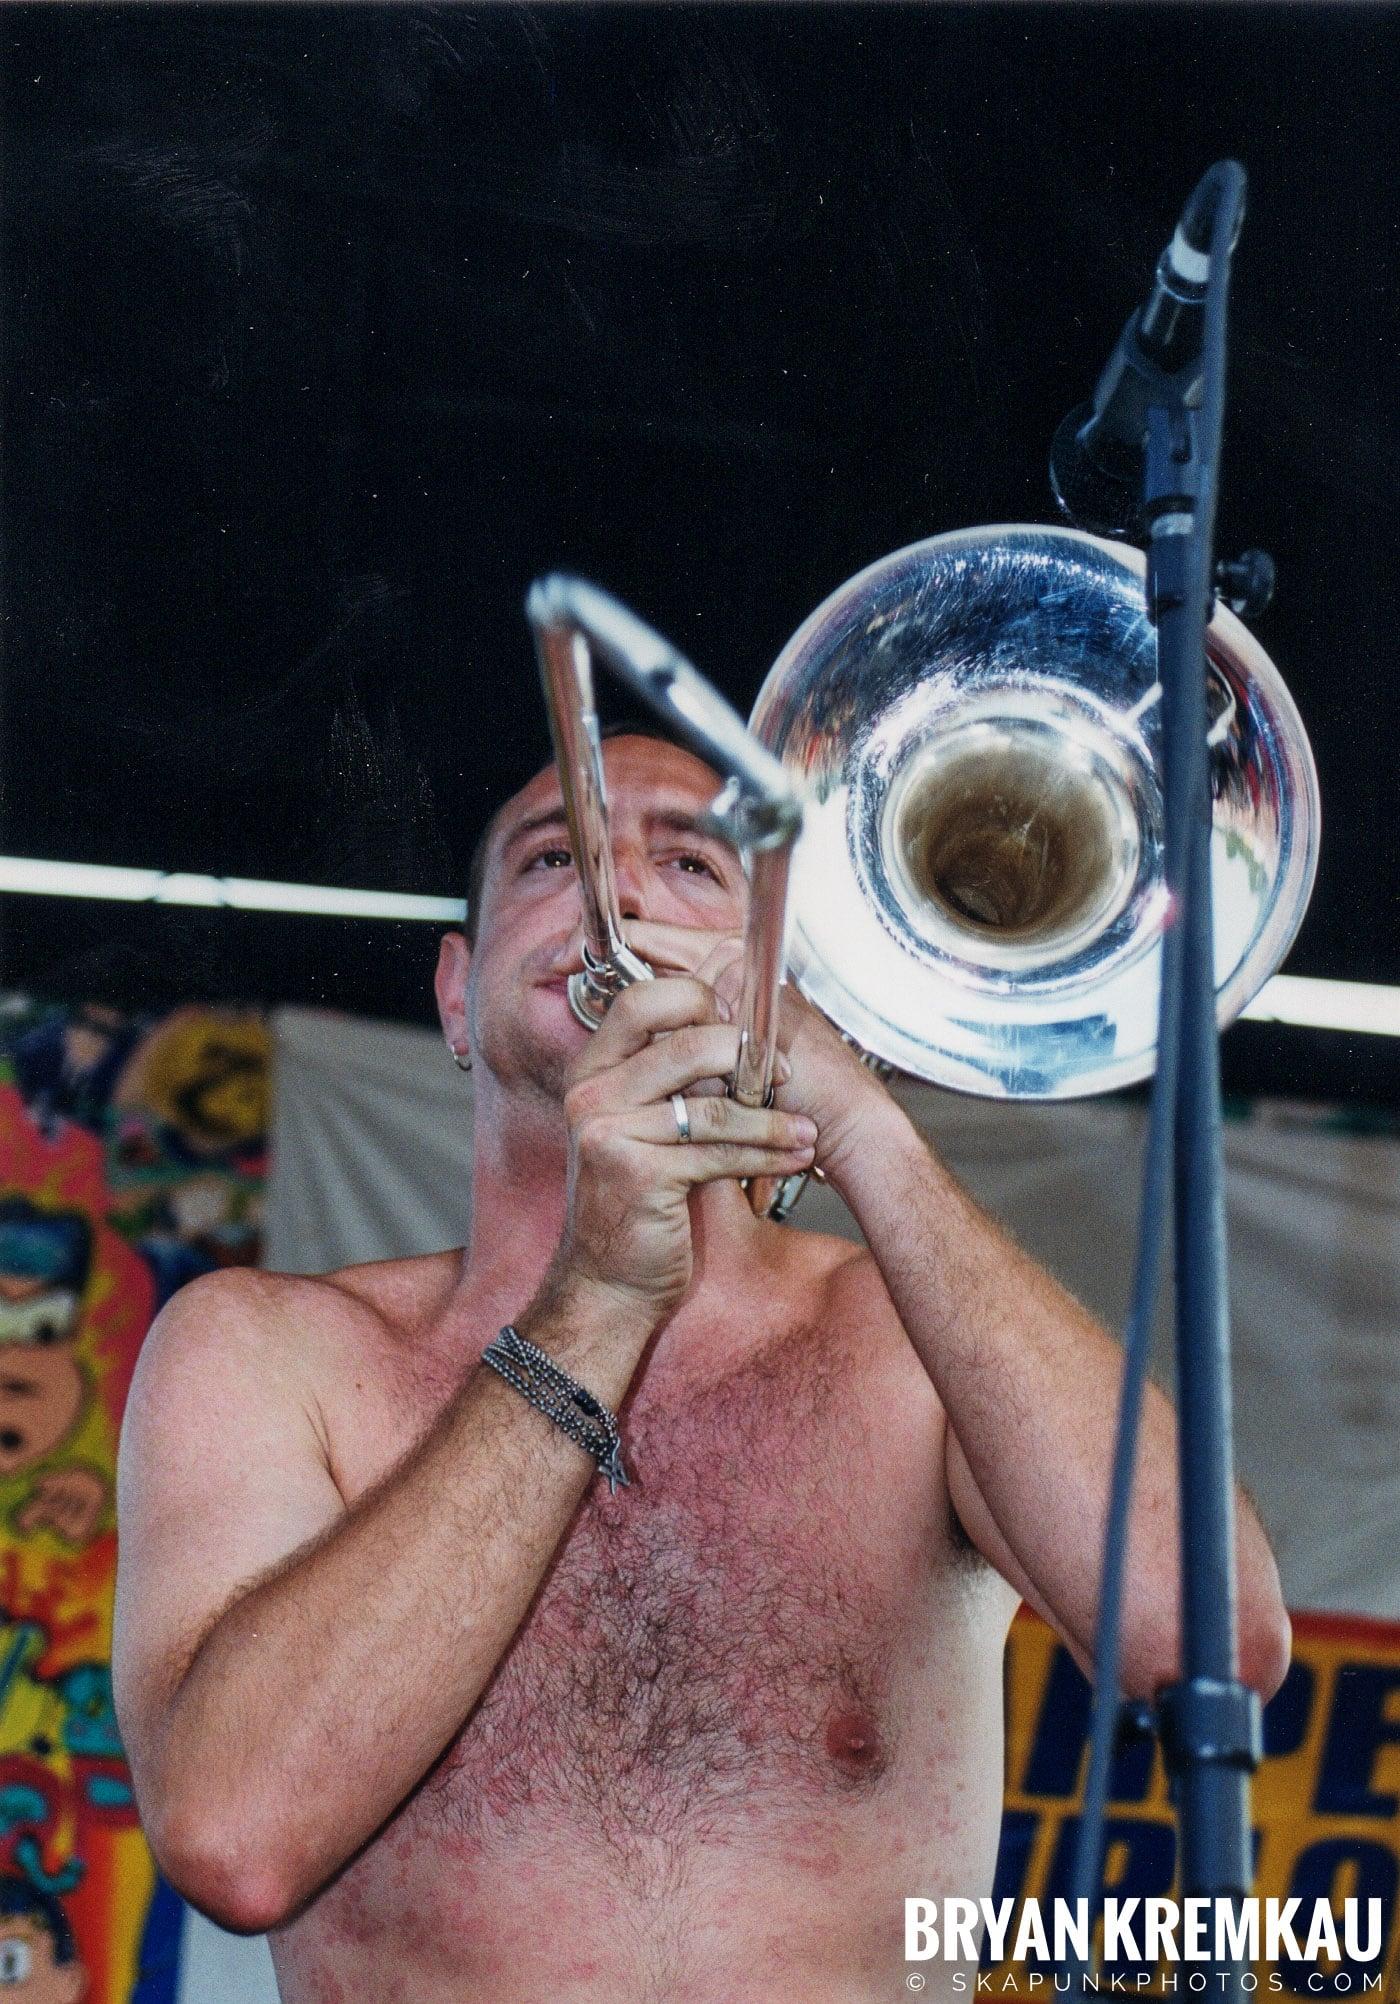 Less Than Jake @ Vans Warped Tour, Randall's Island, NYC - 7.16.99 (9)